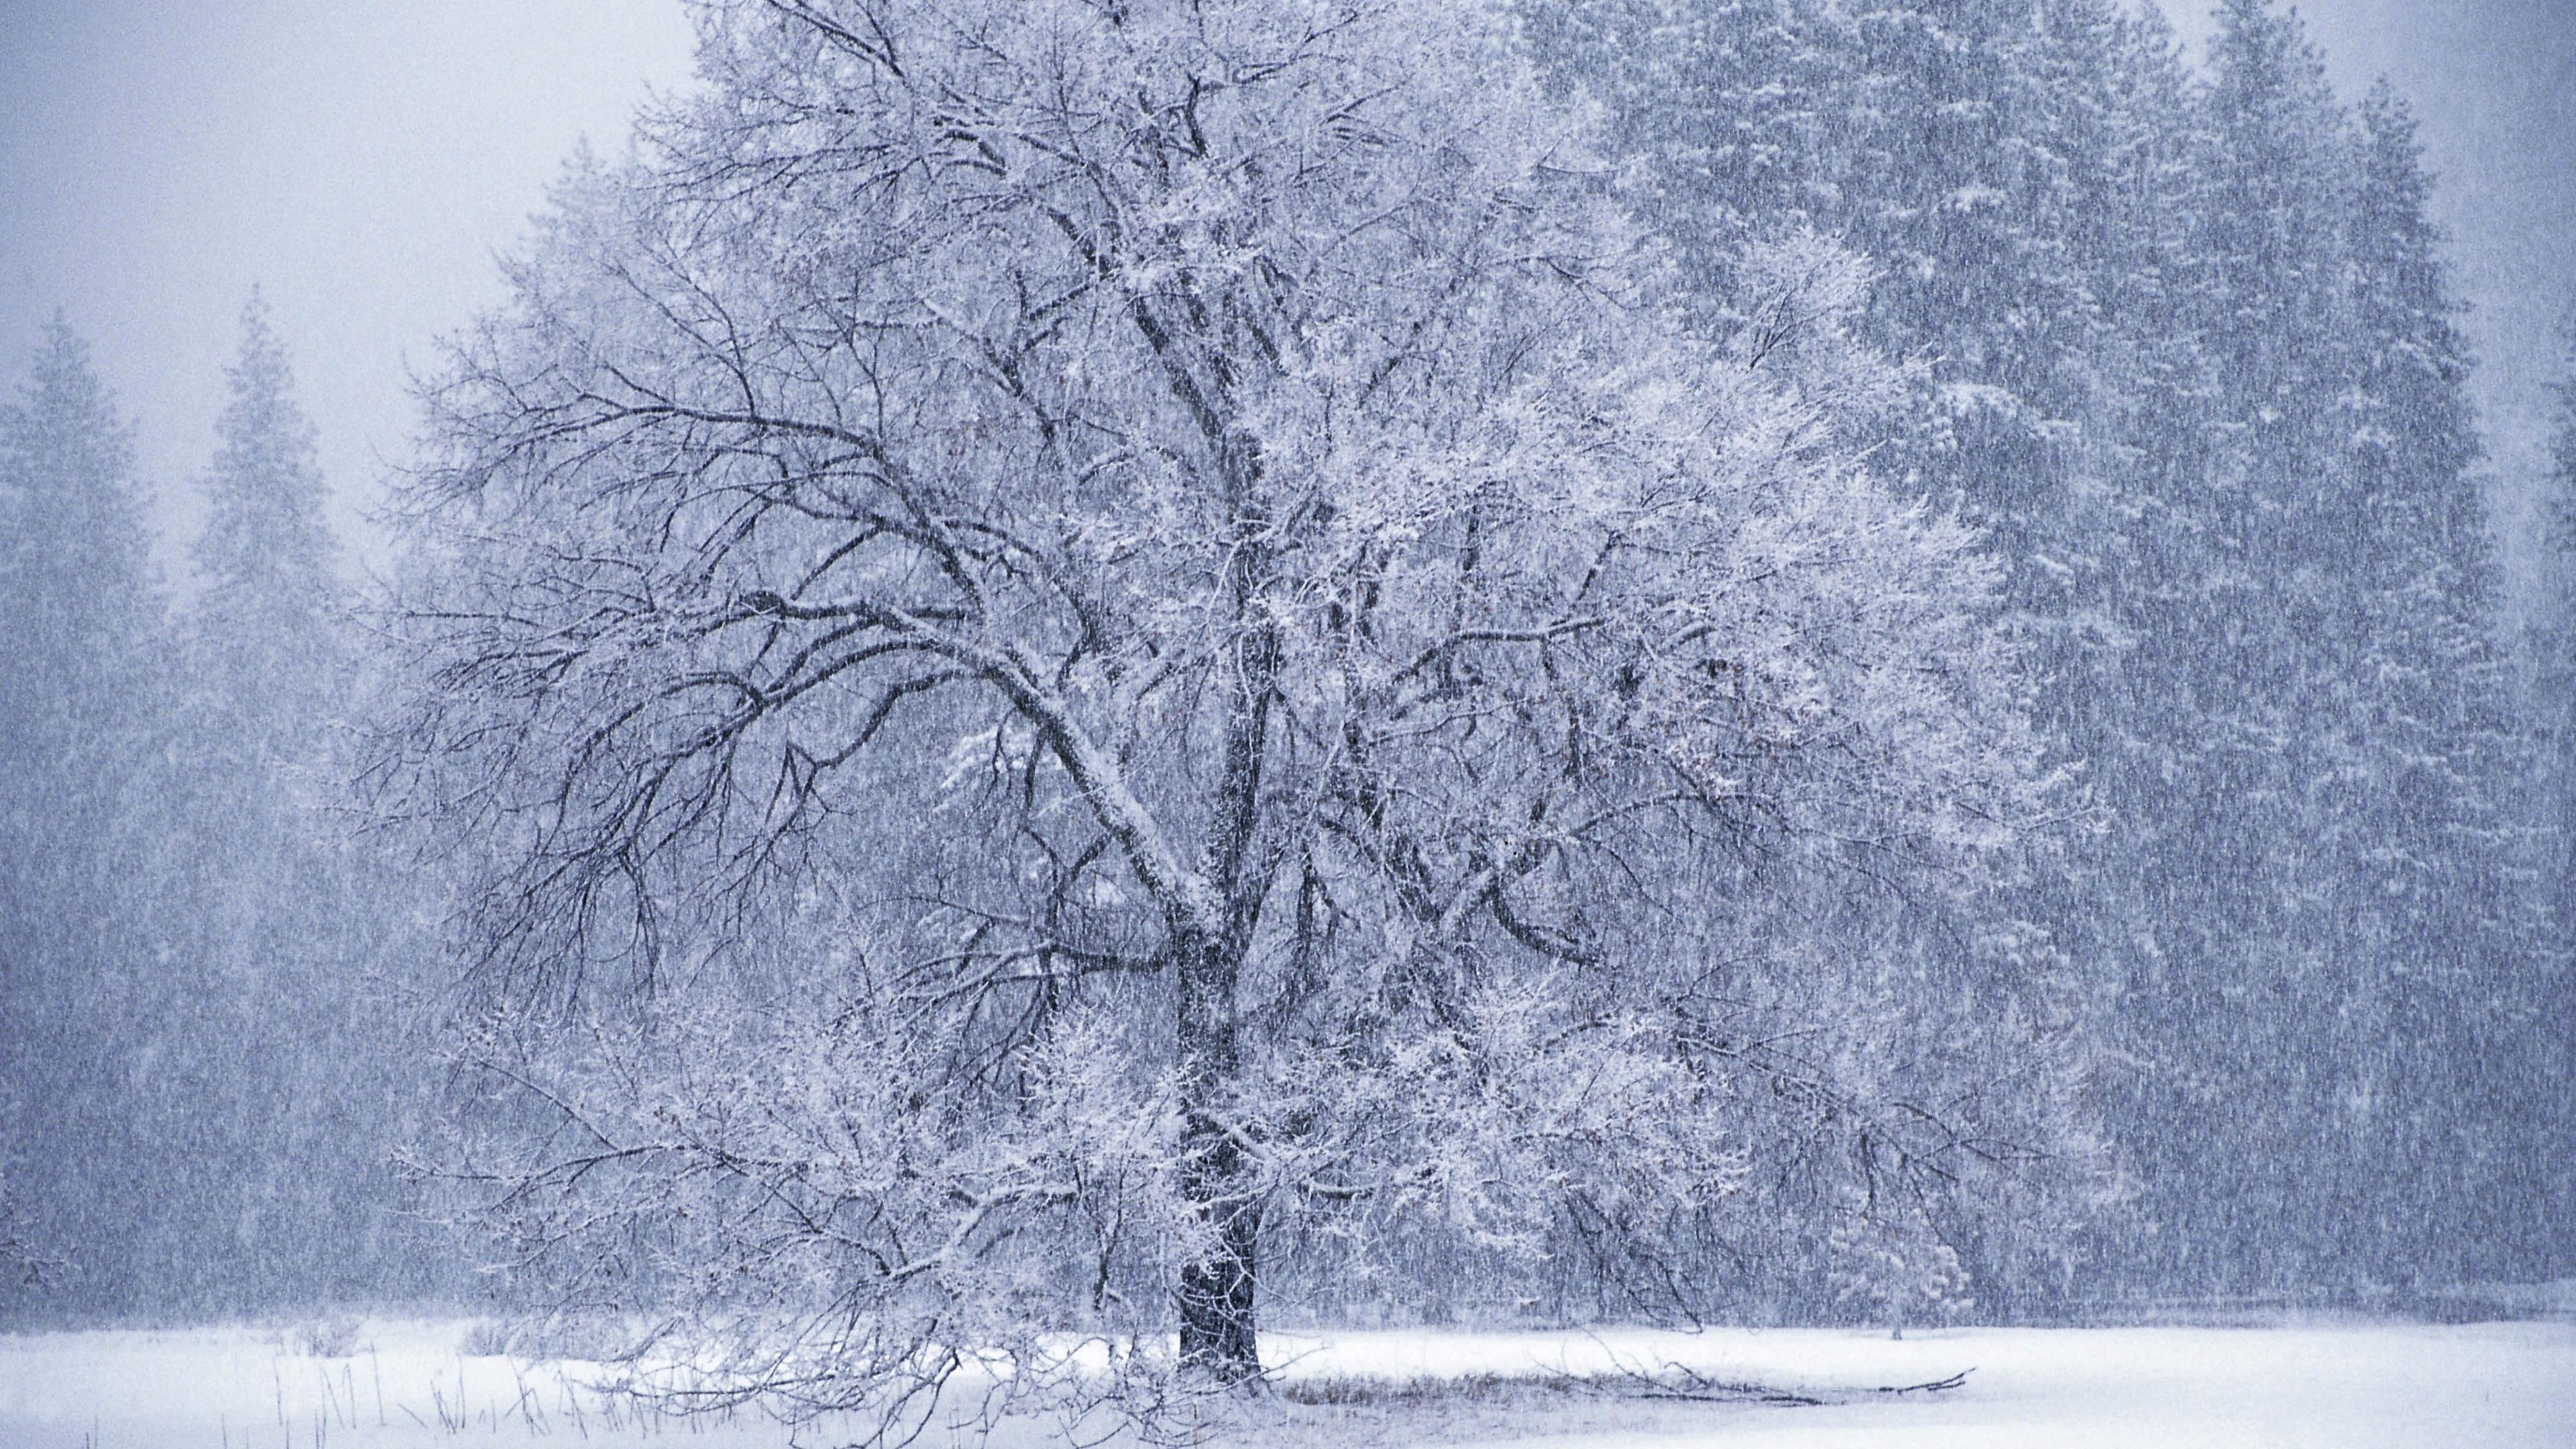 owfall winter hoarfrost 4k 1541114439 - owfall, winter, hoarfrost 4k - Winter, owfall, hoarfrost